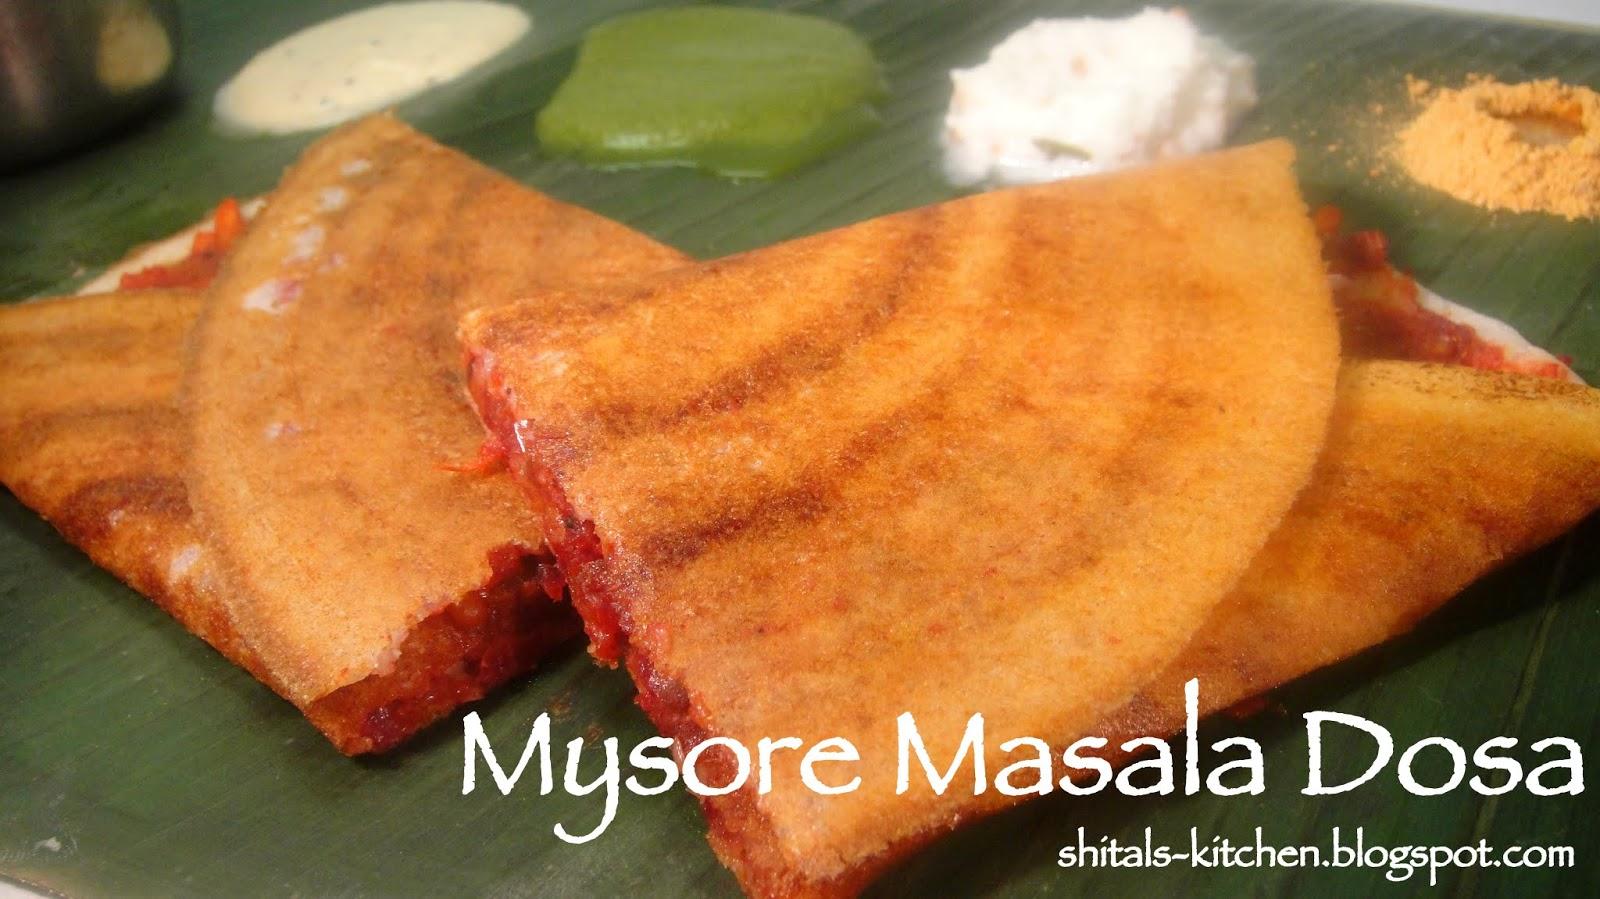 http://shitals-kitchen.blogspot.com/2013/07/mumbai-street-food-mysore-masala-dosa.html